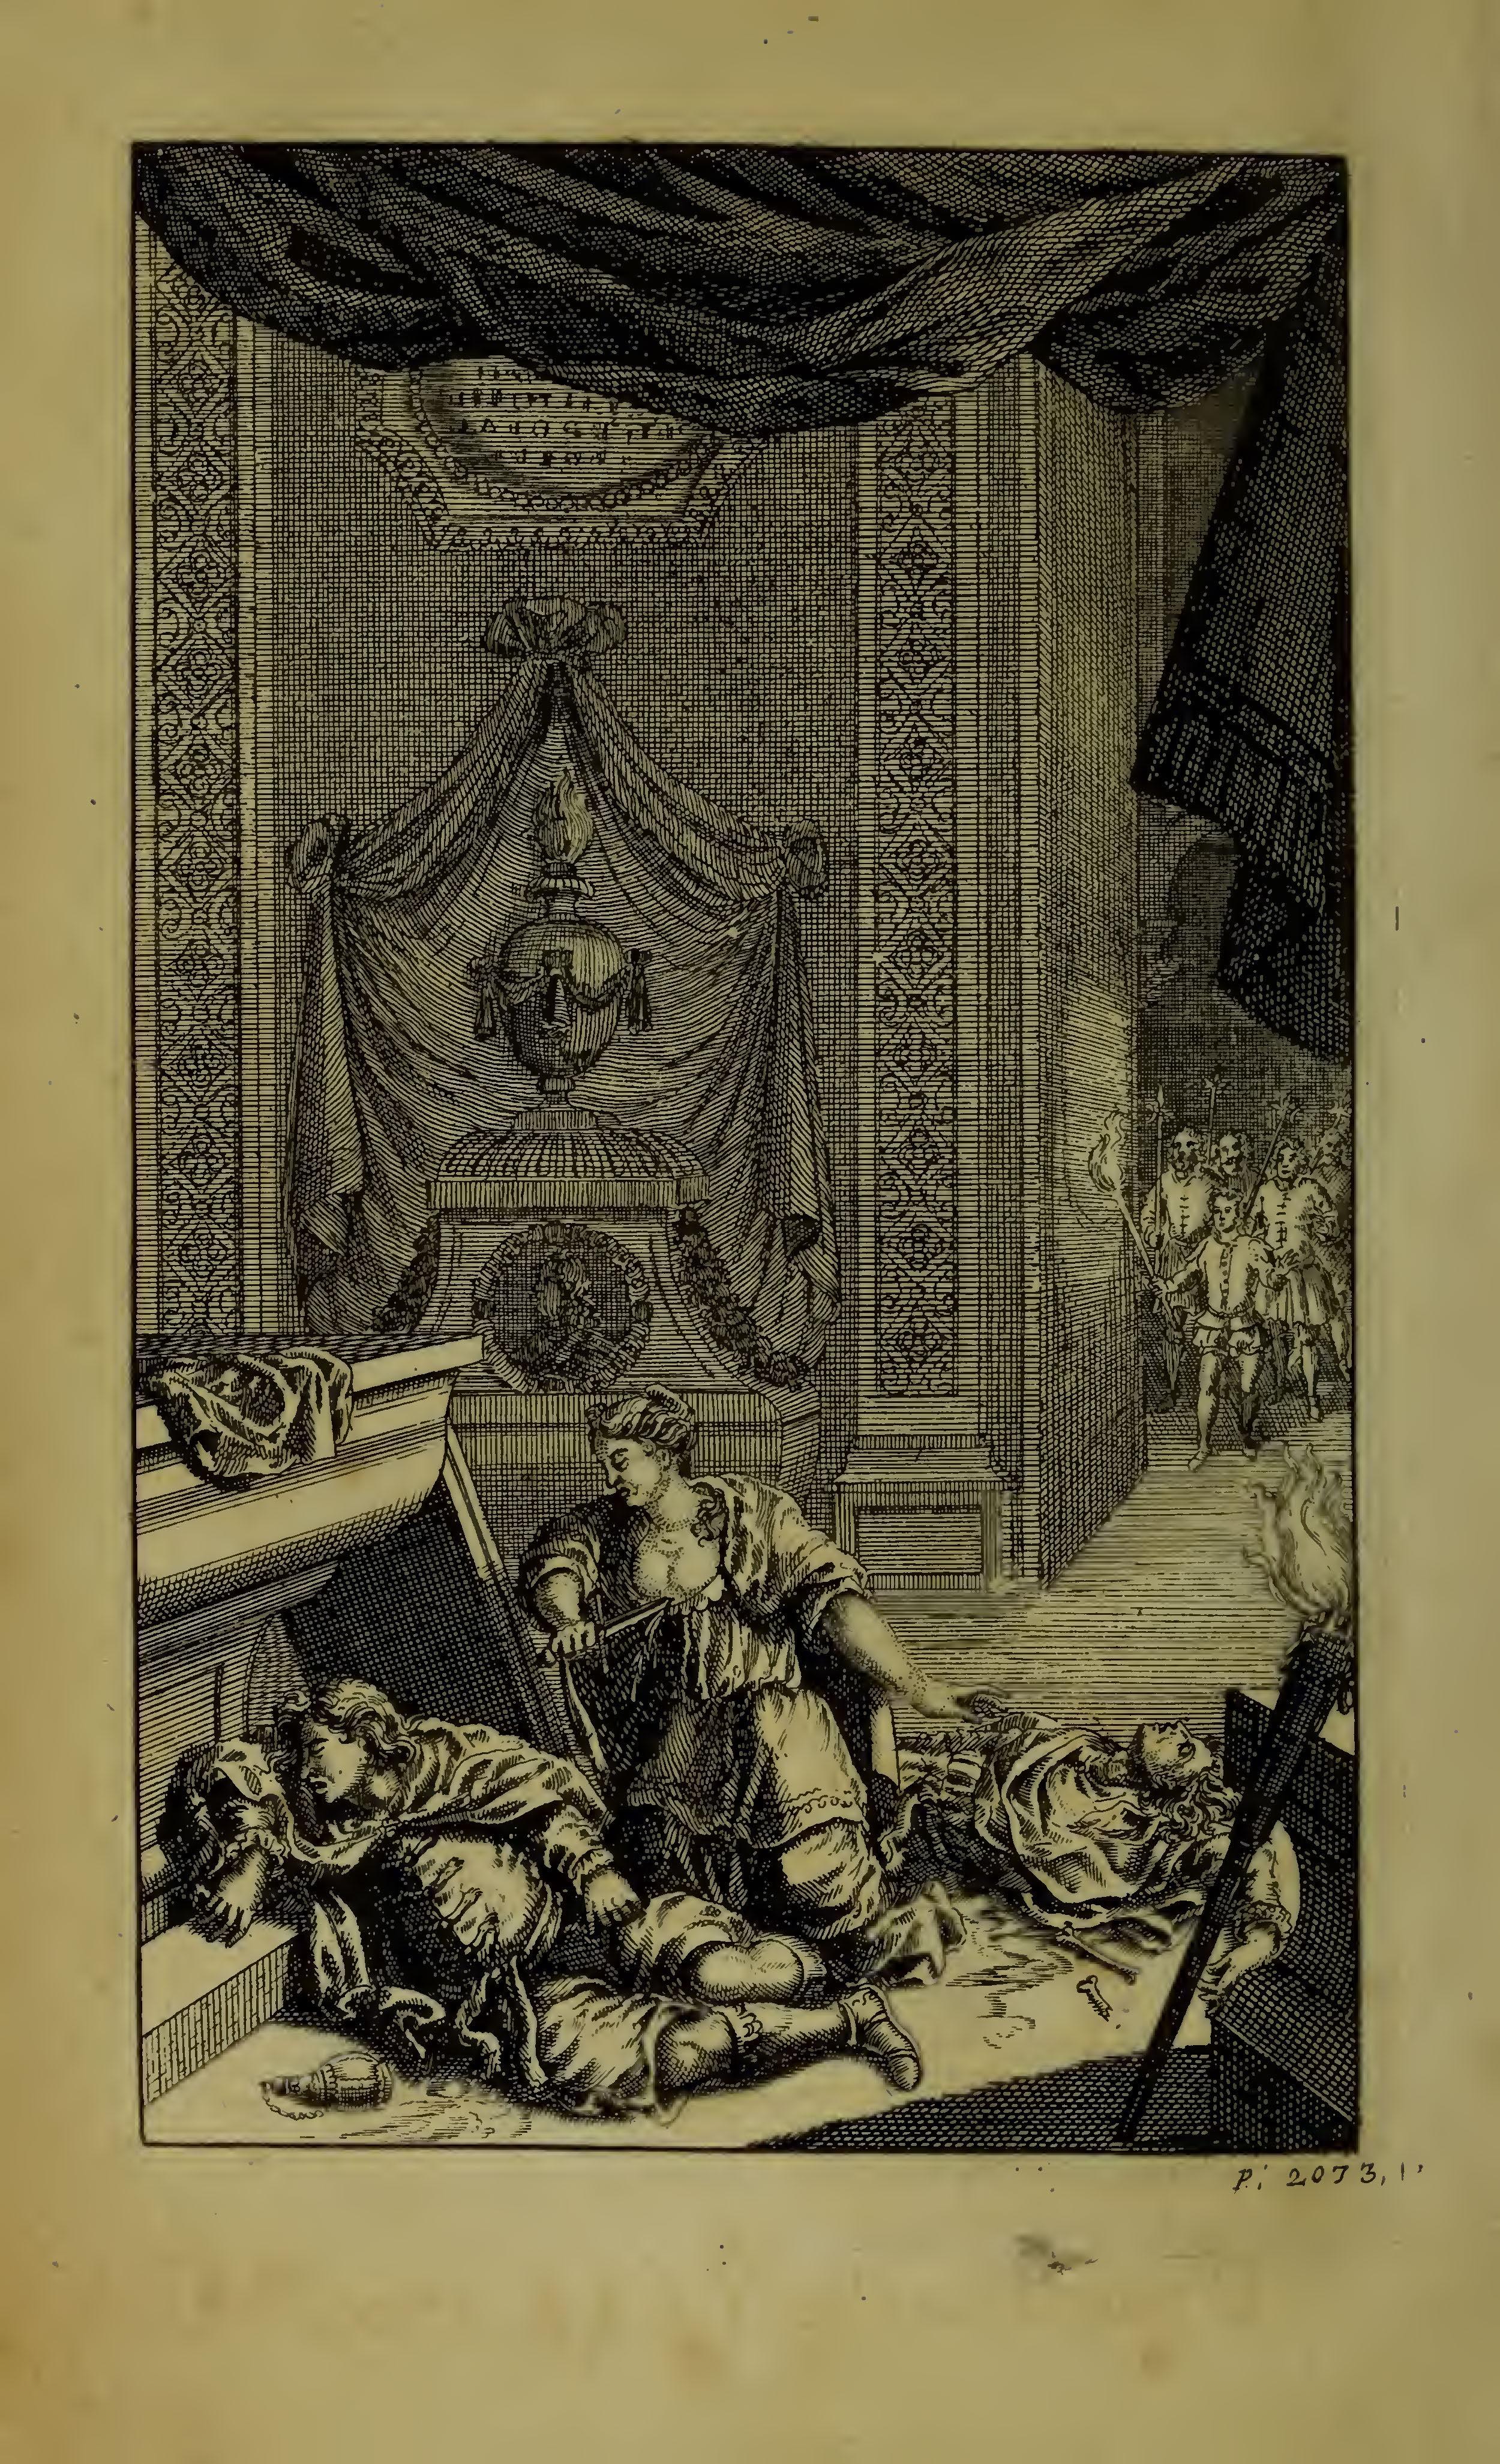 Rowe 1709 volume 5, page 4